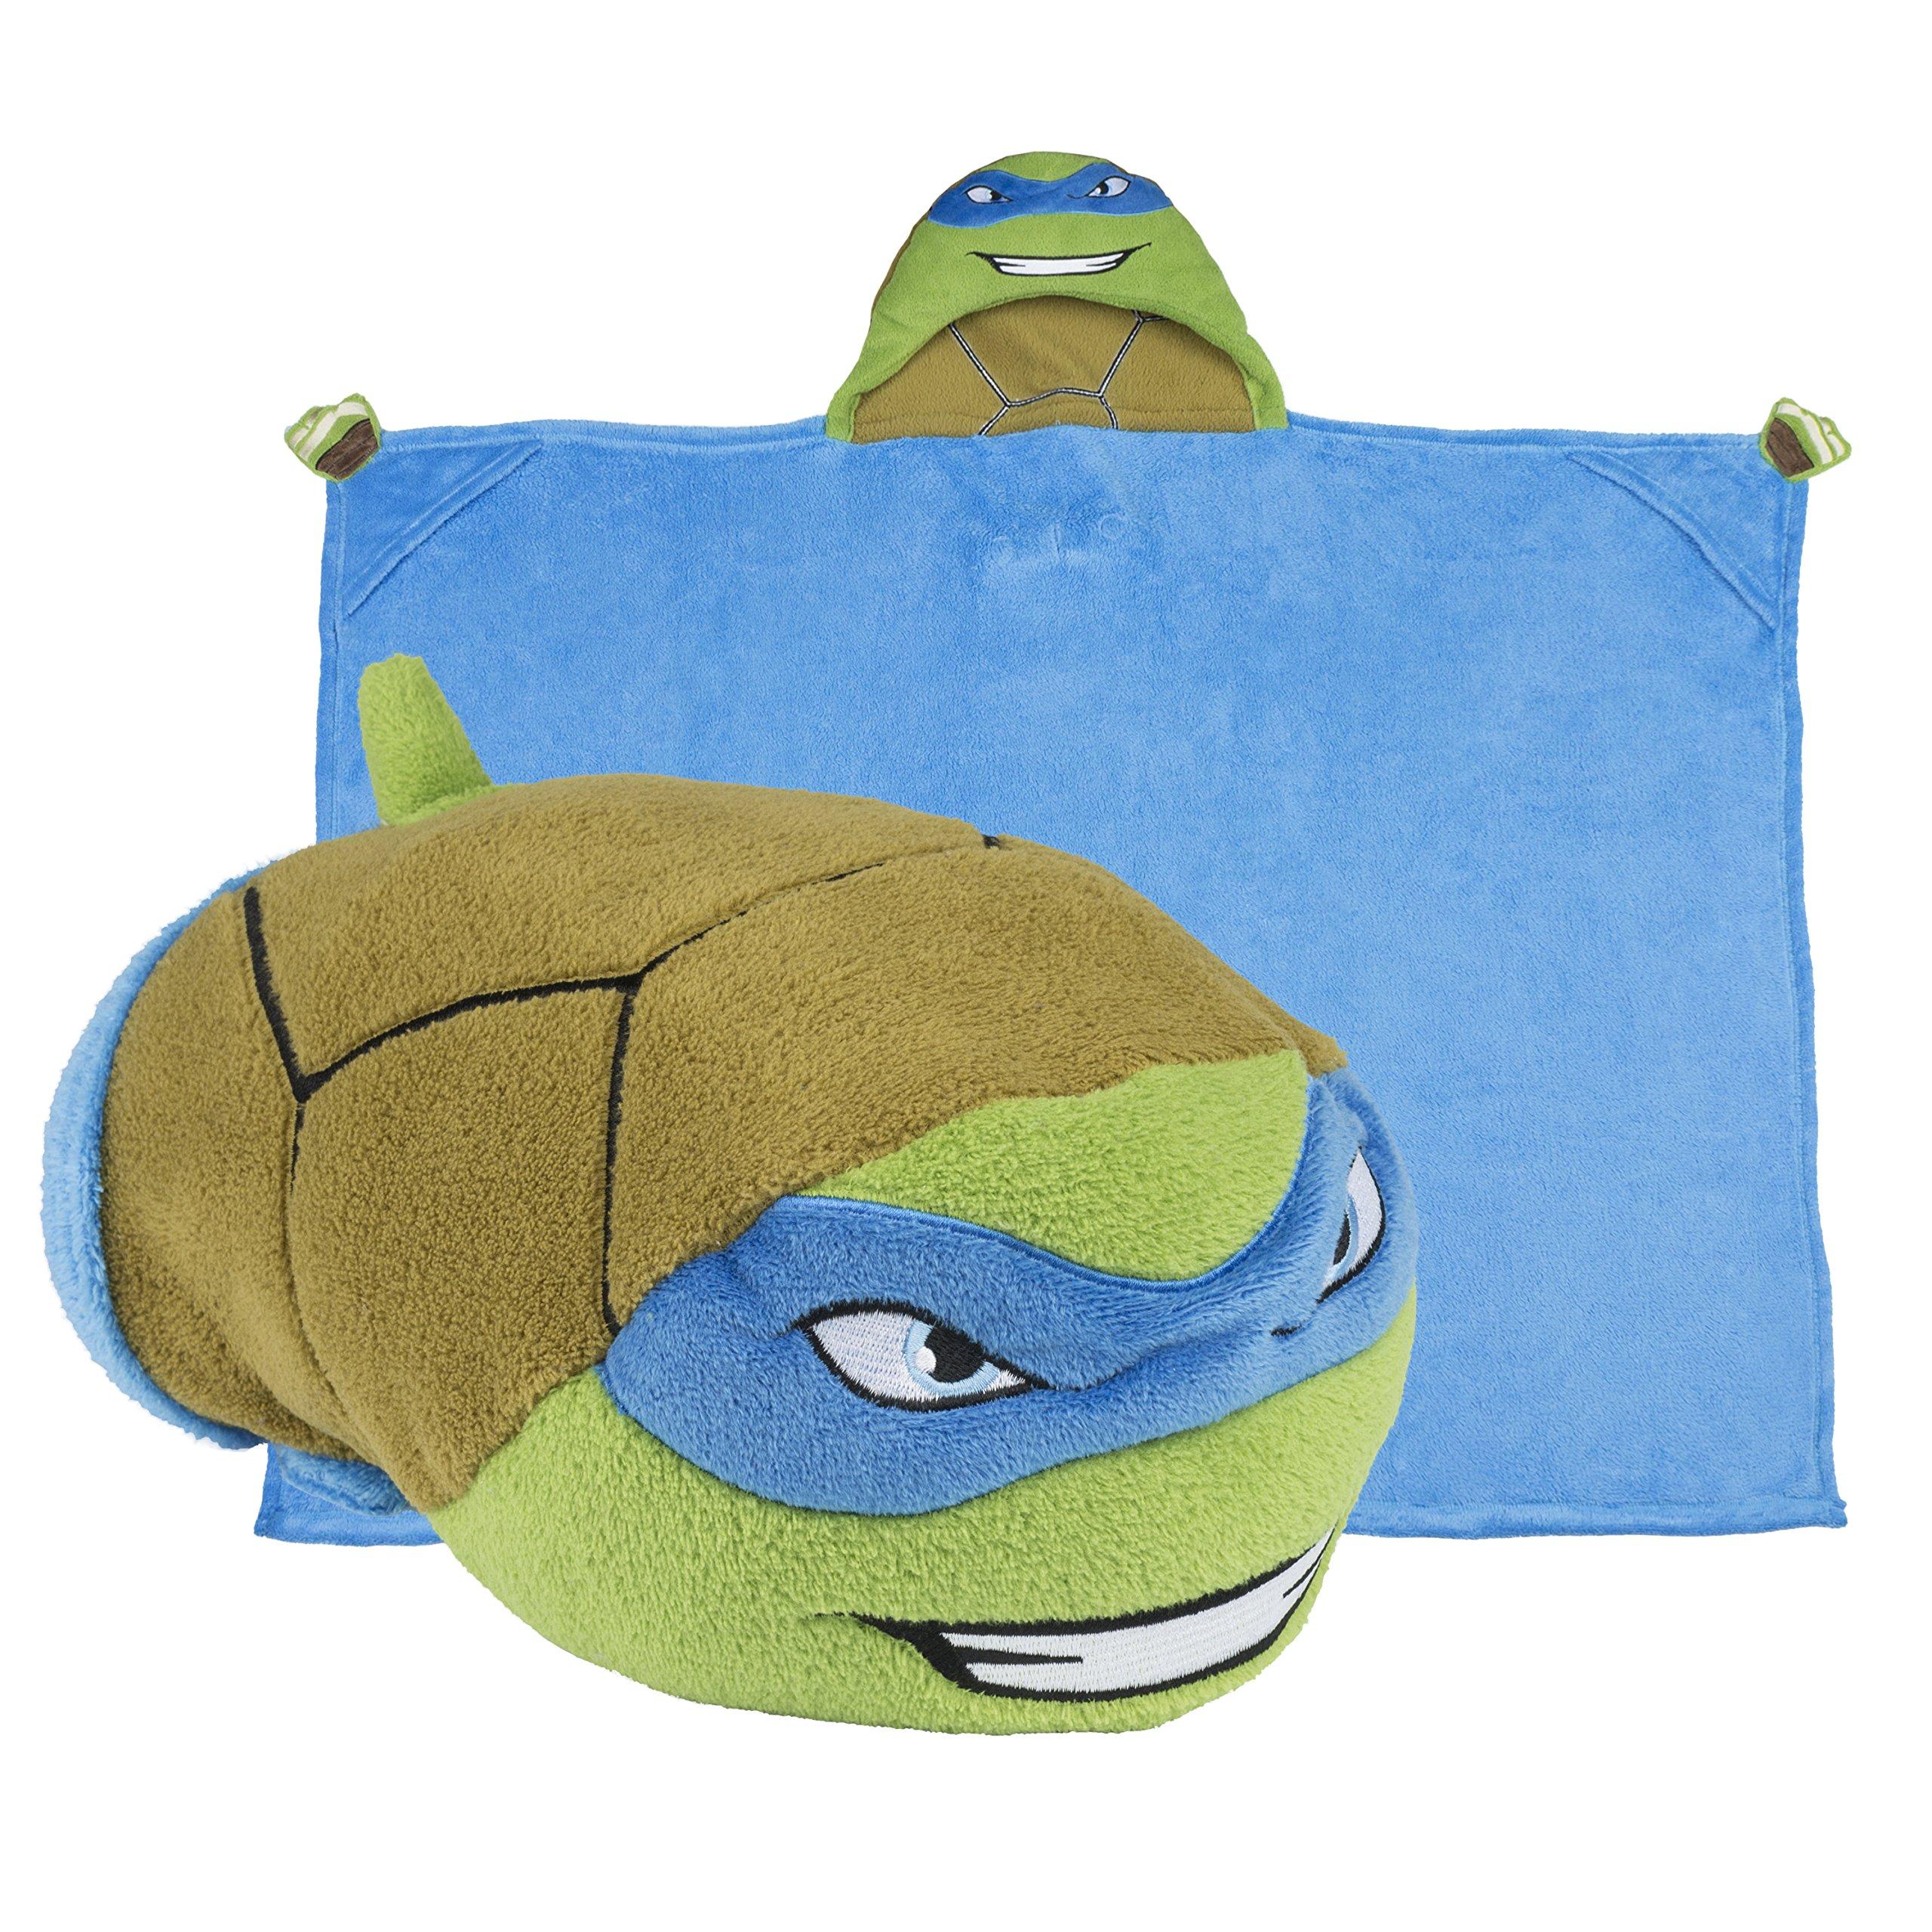 Comfy Critters Stuffed Animal Blanket - Teenage Mutant Ninja Turtles (TMNT), Leonardo - Kids huggable pillow and blanket perfect for pretend play, travel, nap time.